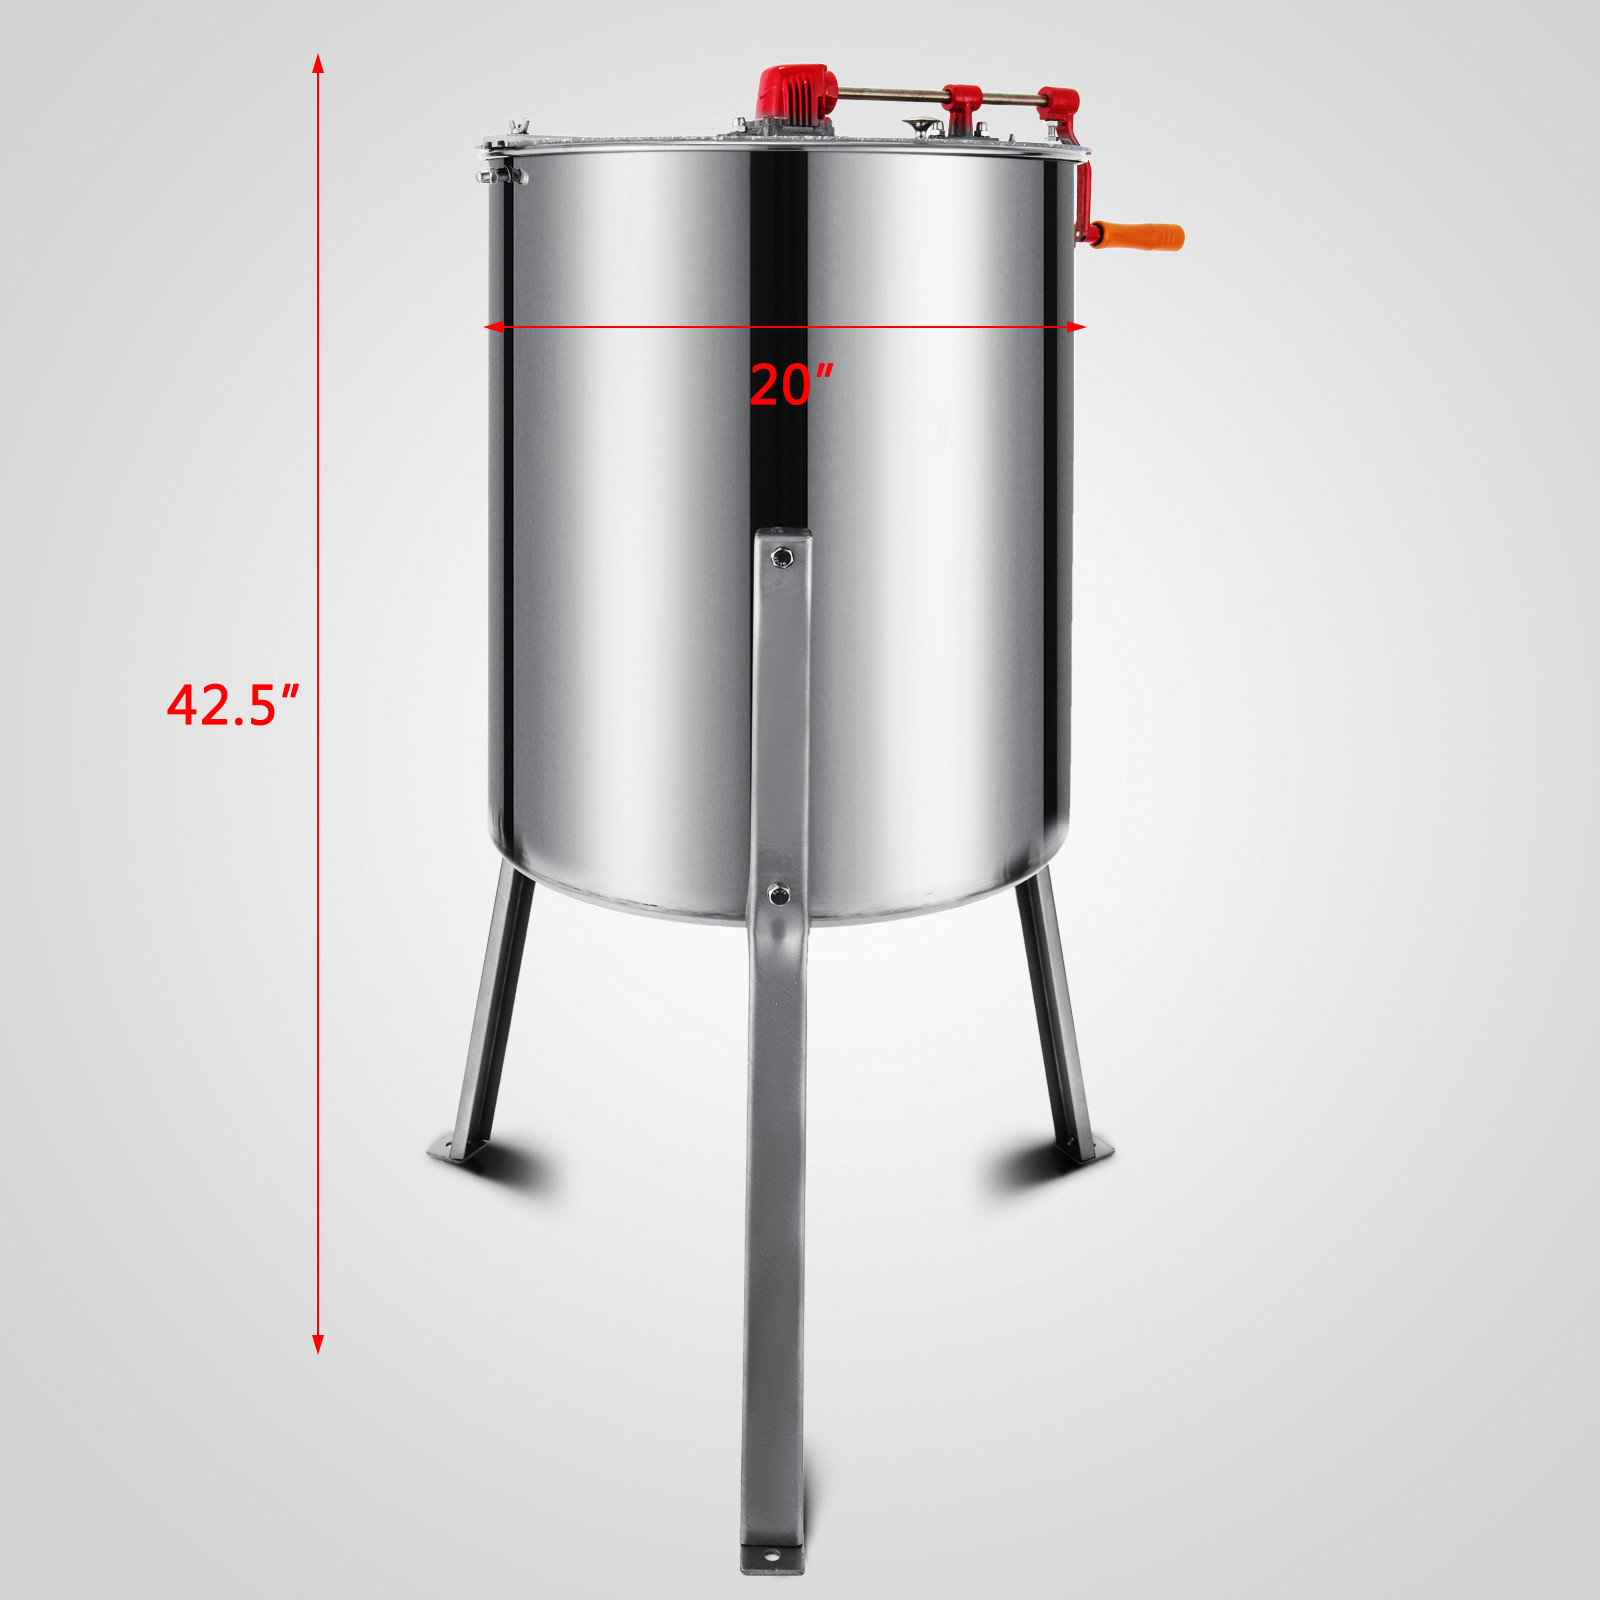 Extracteur-de-Miel-Electrique-manuelle-2-3-4-Cadres-En-Acier-Inox-Centrifugeuse miniature 74